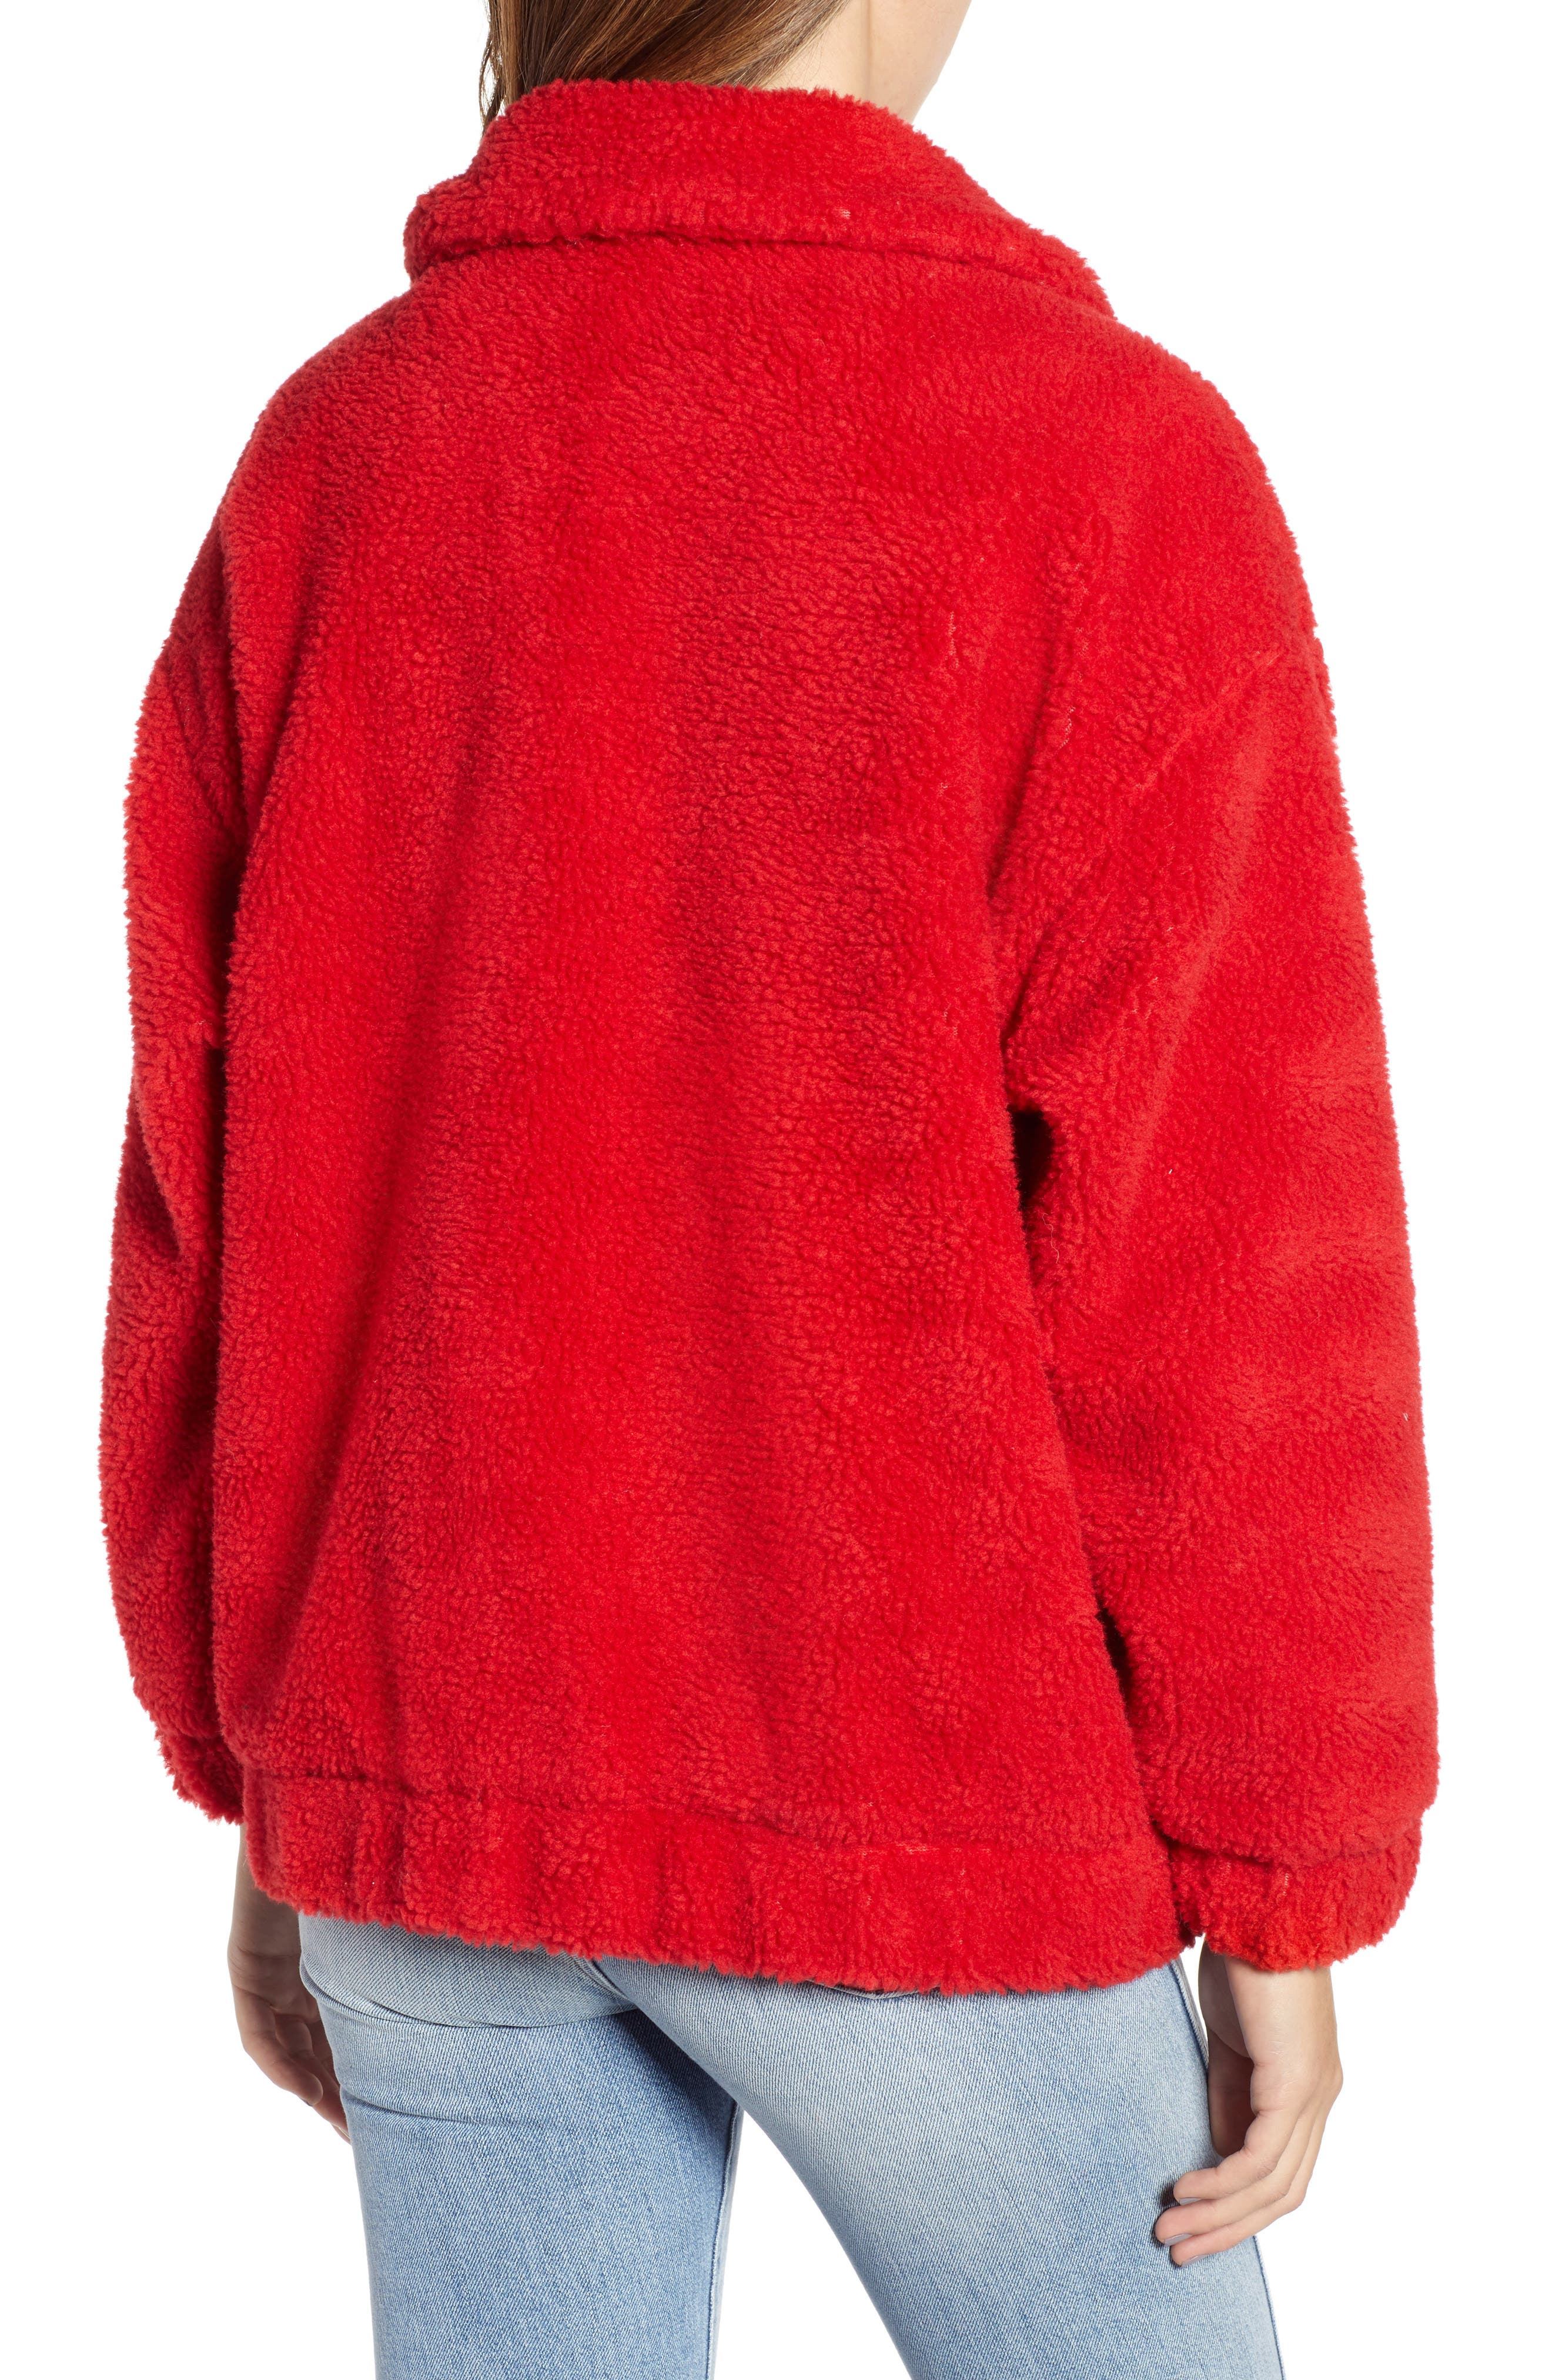 Oversized Fleece Jacket,                             Alternate thumbnail 2, color,                             RED